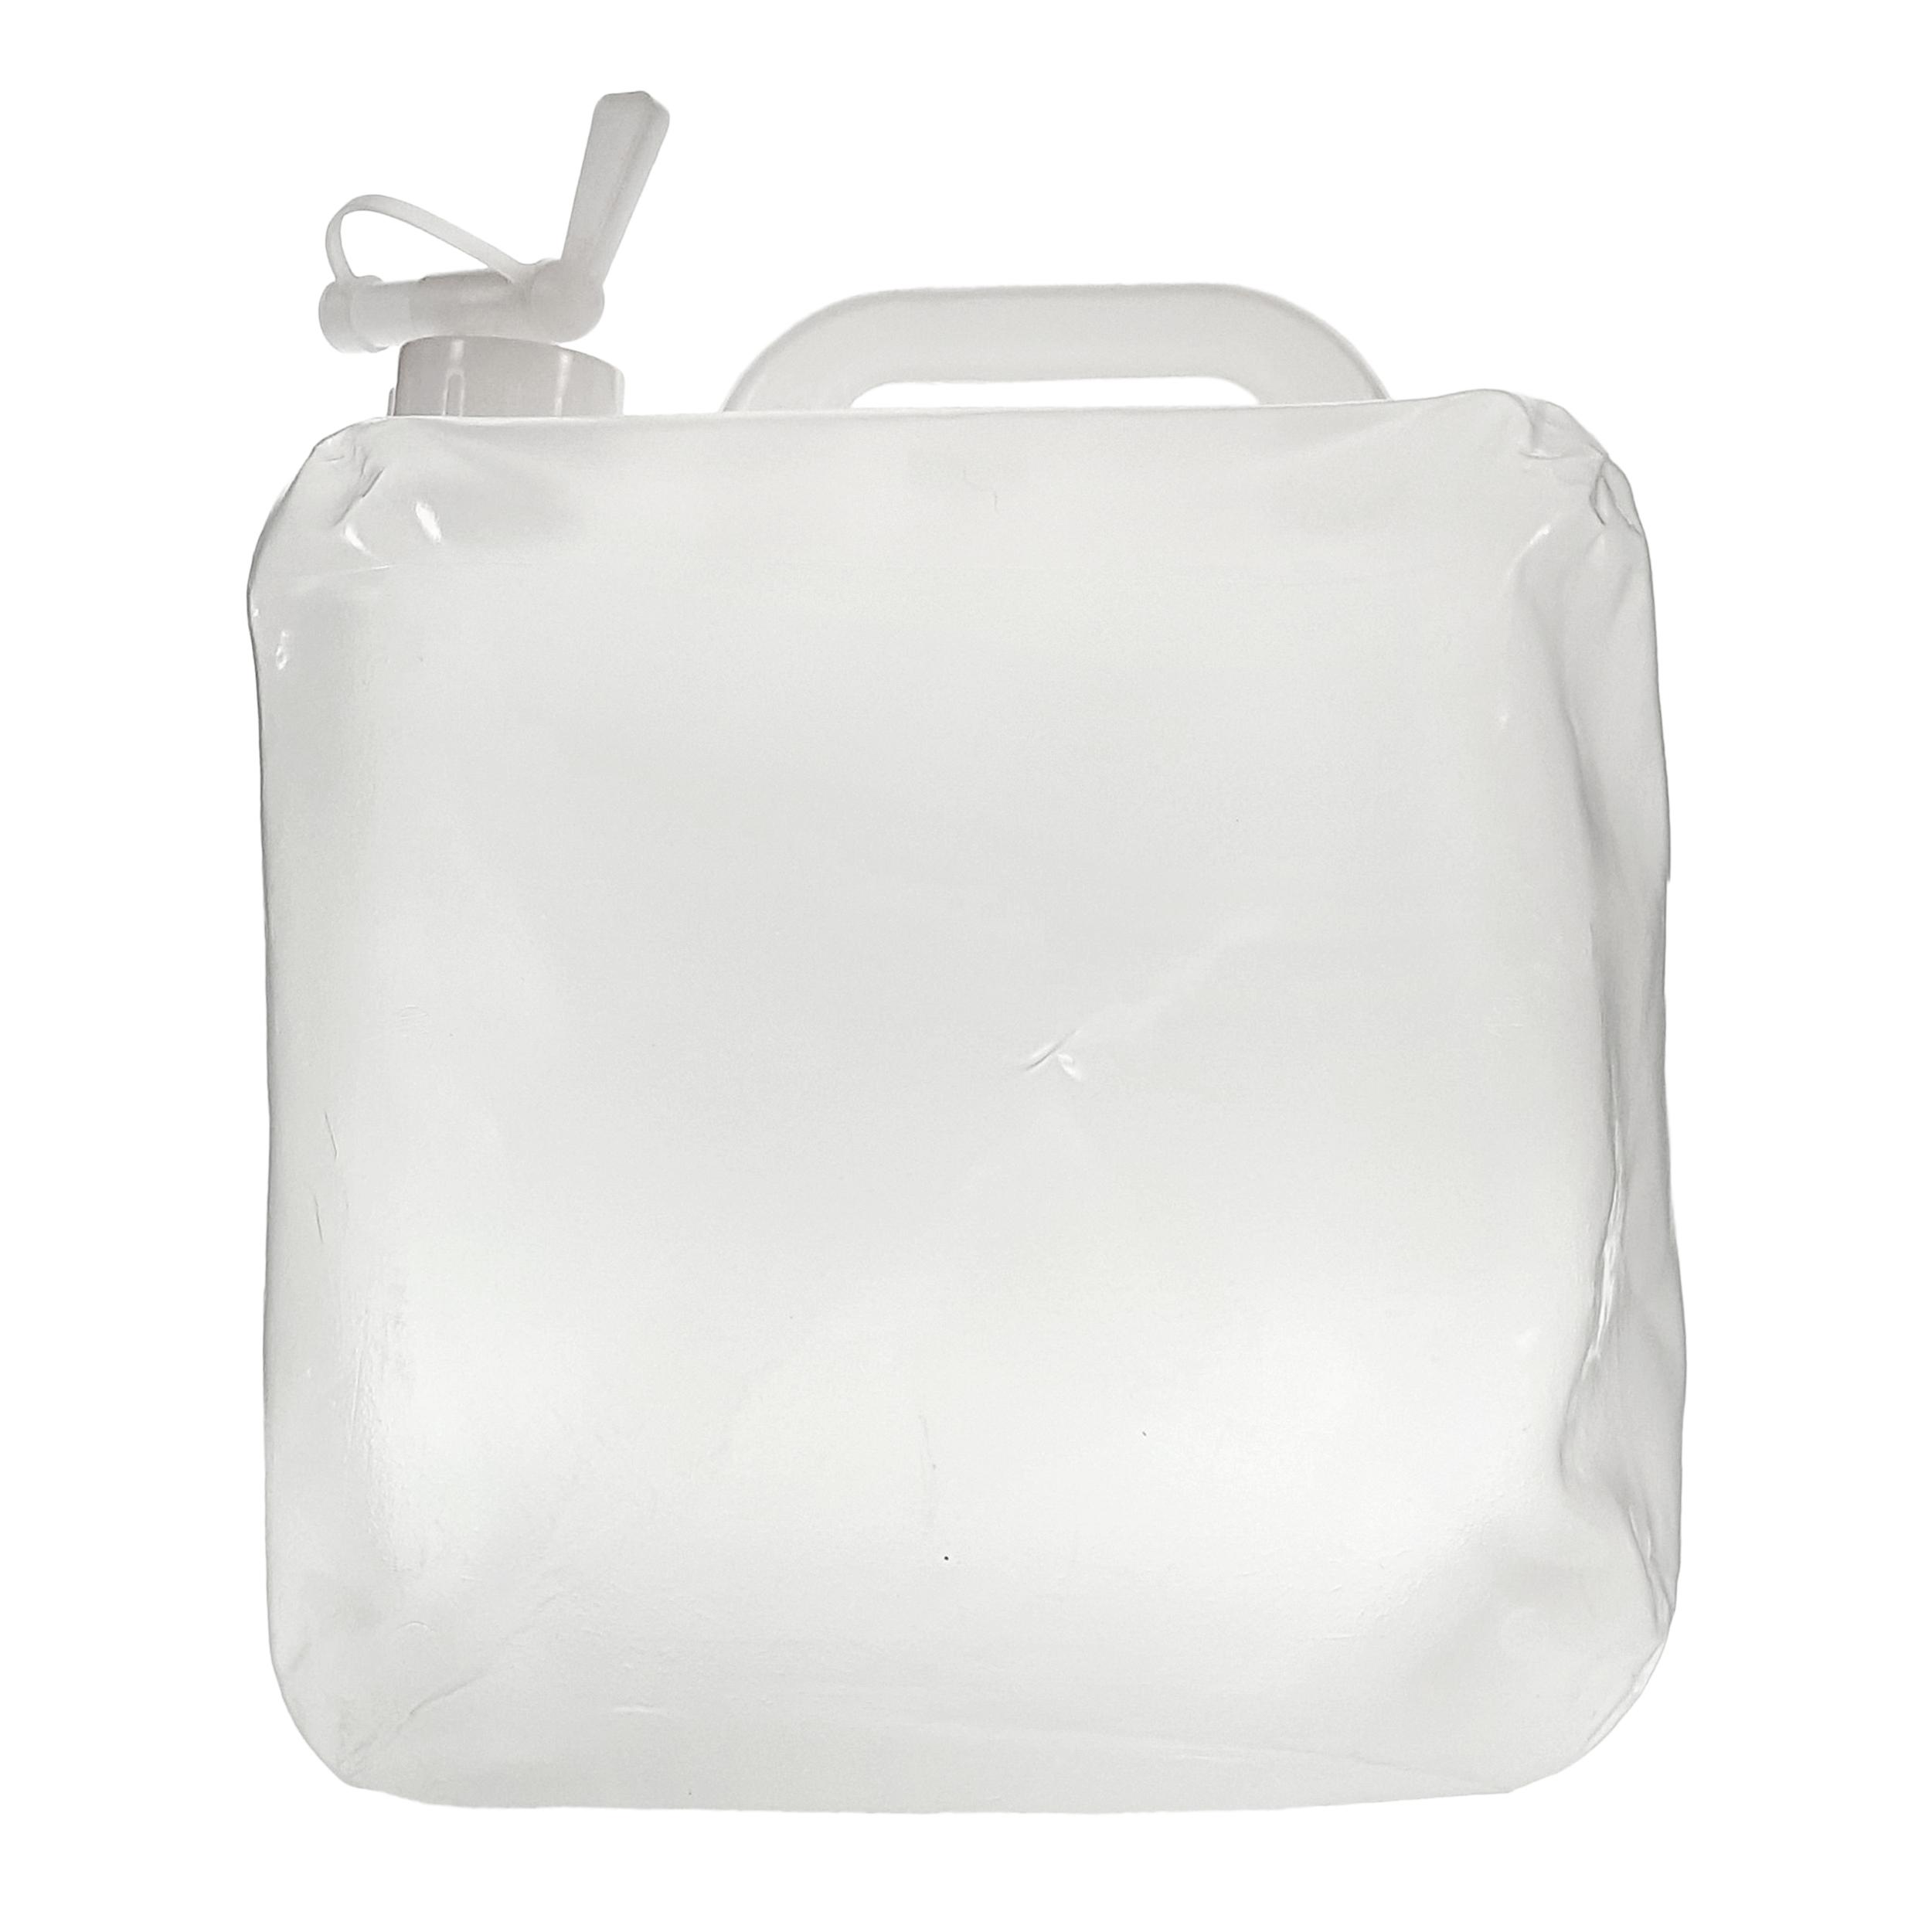 نگهدارنده آب 10 لیتری کووآ کد KWB-1301